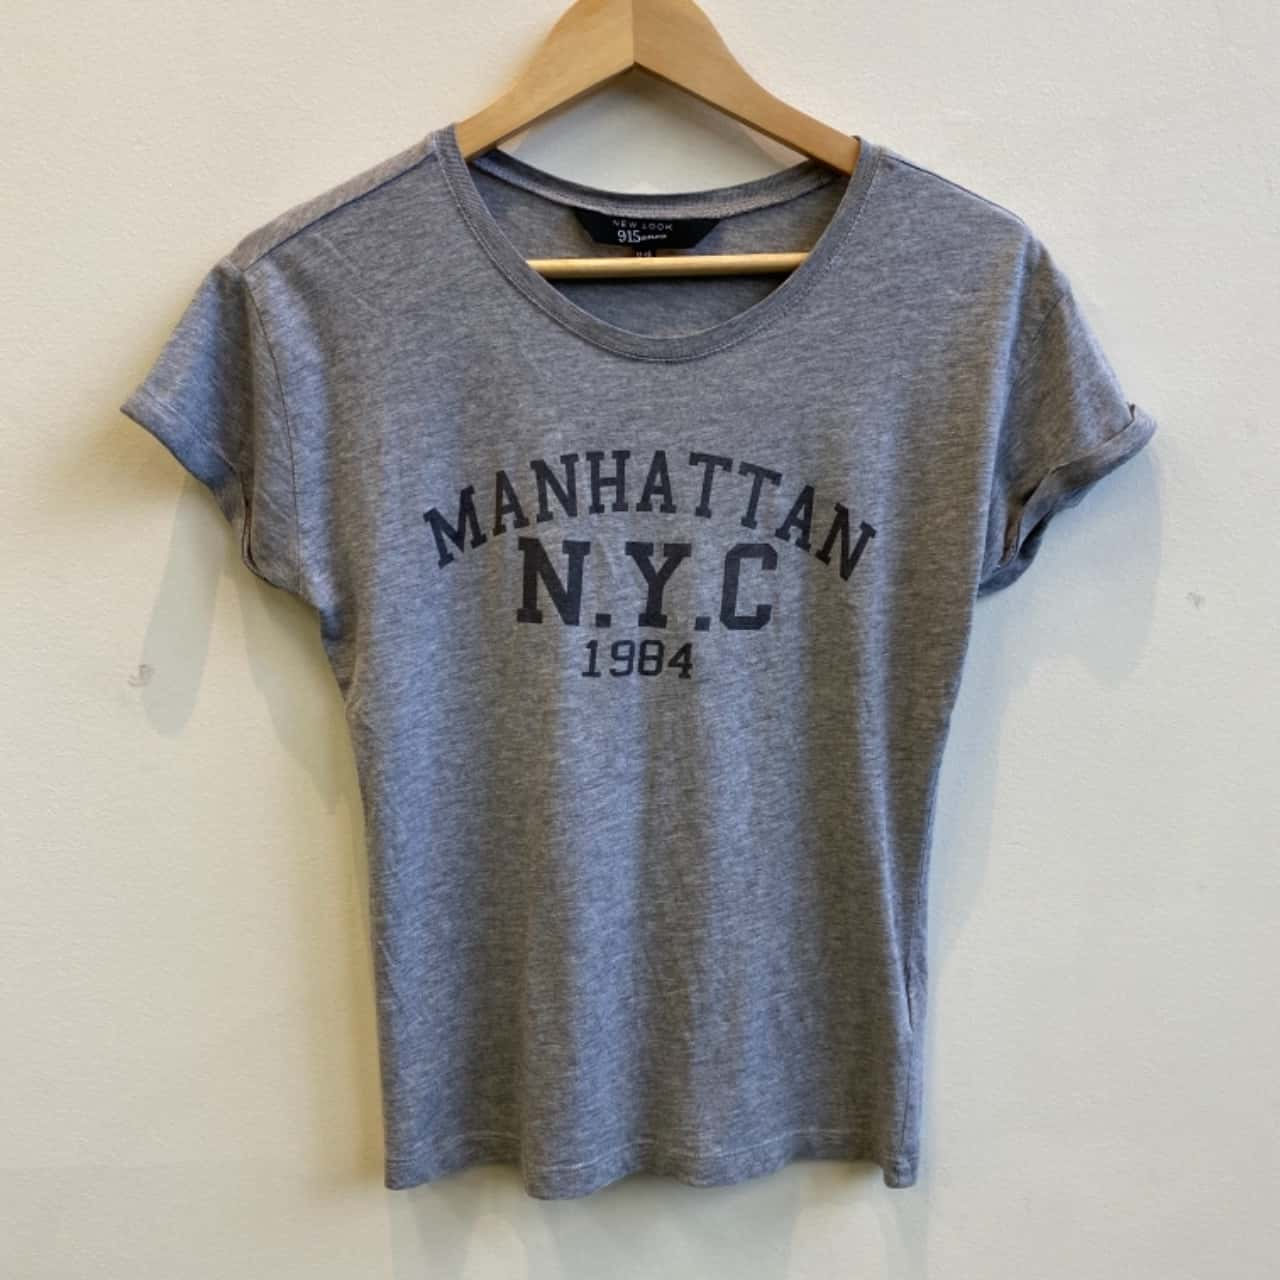 New Look Girls Manhattan Print Grey T-shirt Size 12/13 Years